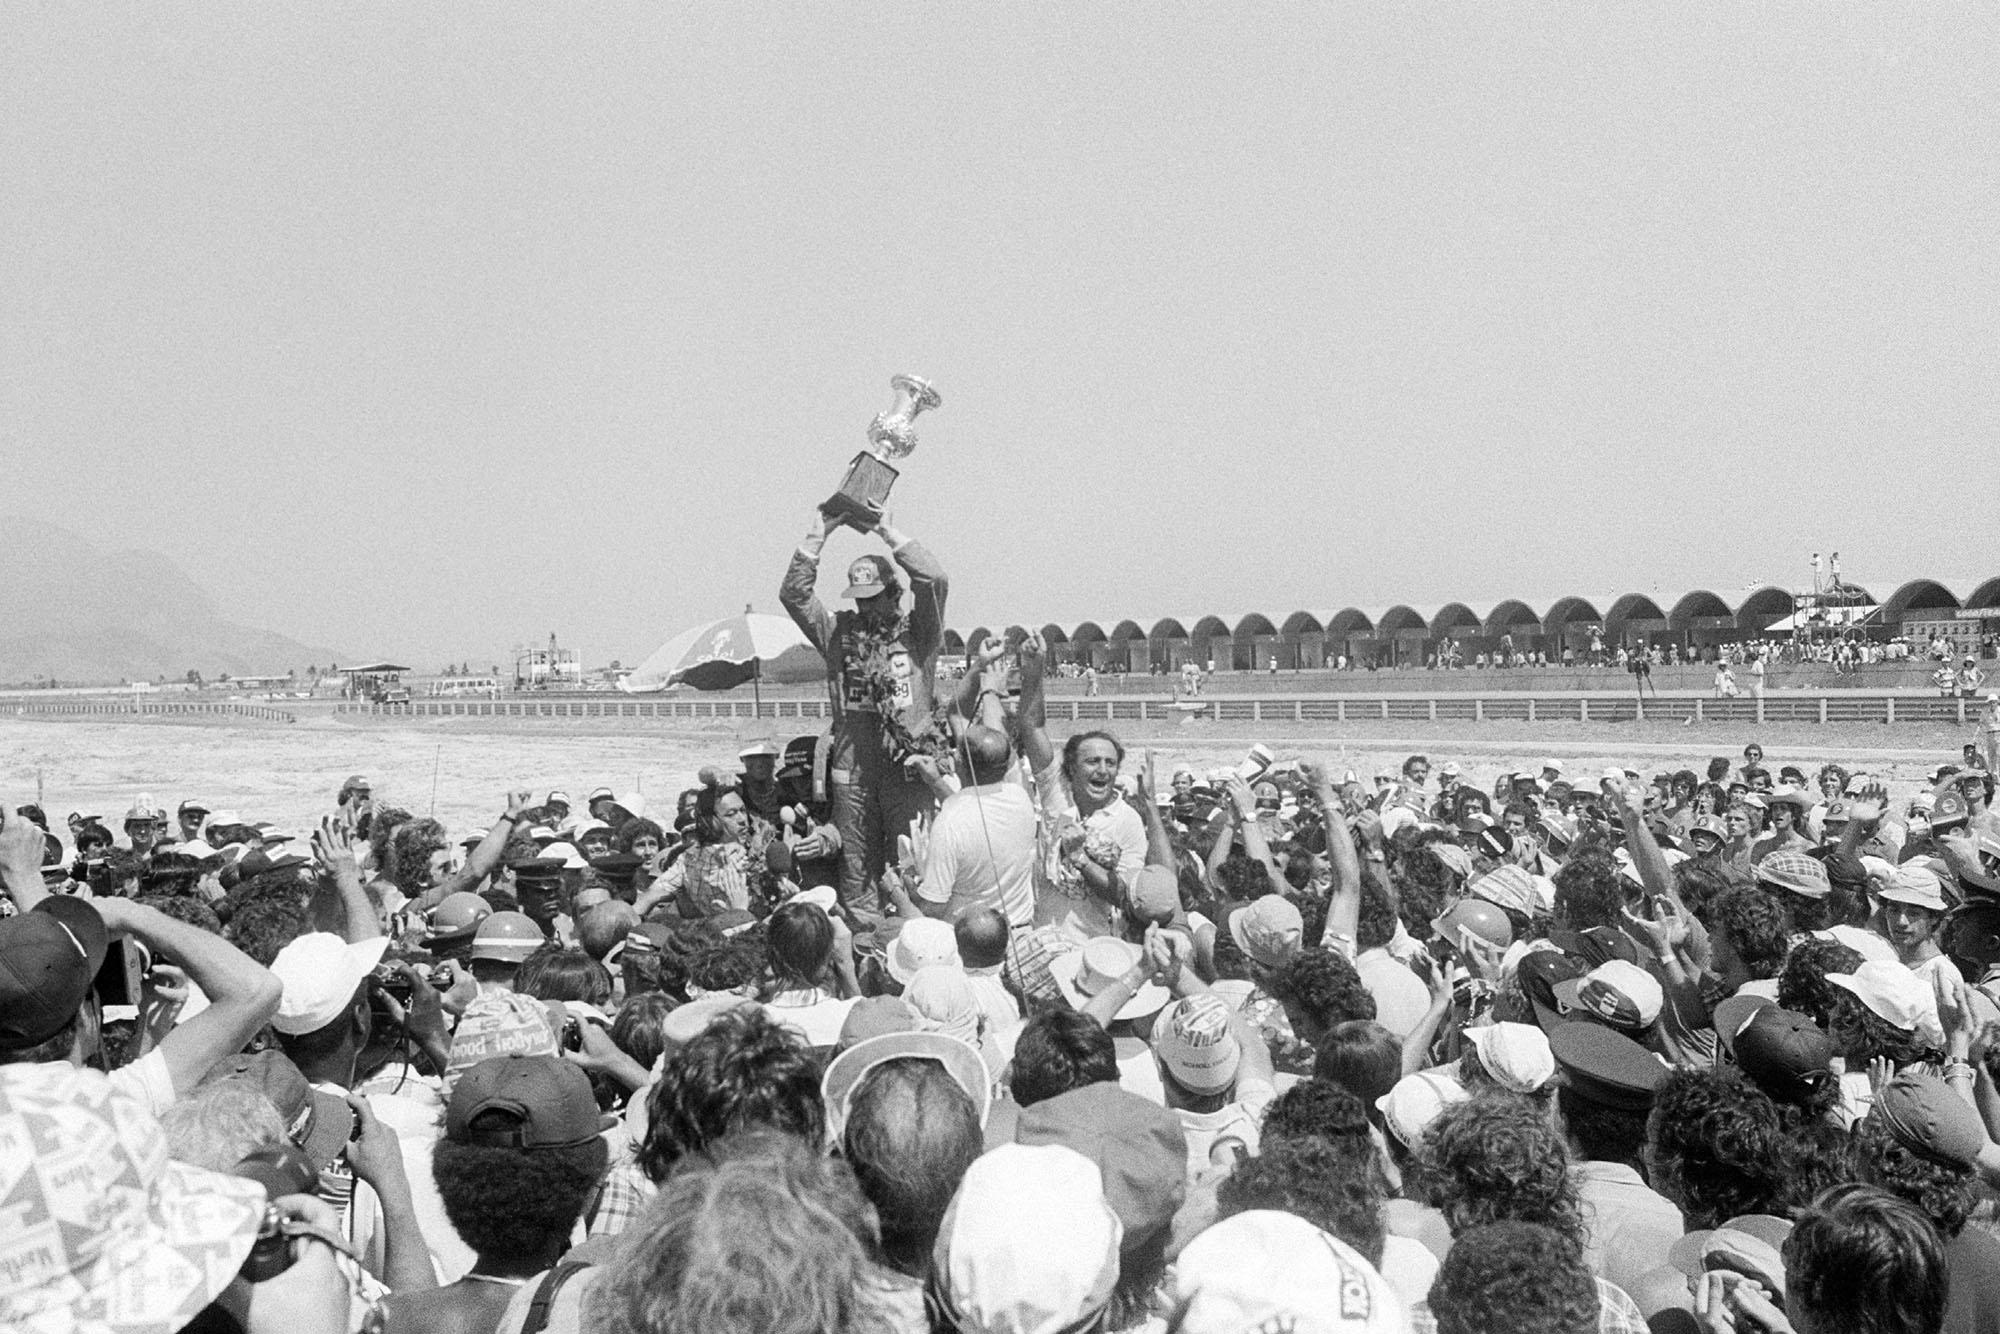 Carlos Reutemann (Ferrari) celebrates winning the 1978 Brazilian Grand Prix, Jacarepagua.